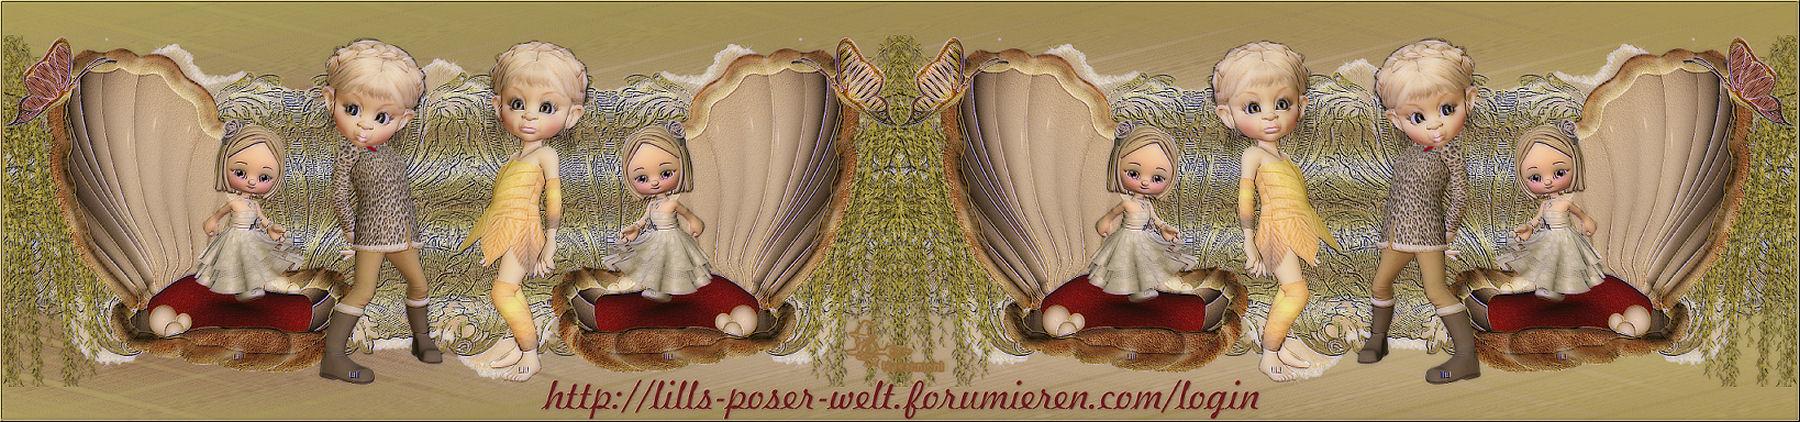 Lills-Poser-Welt